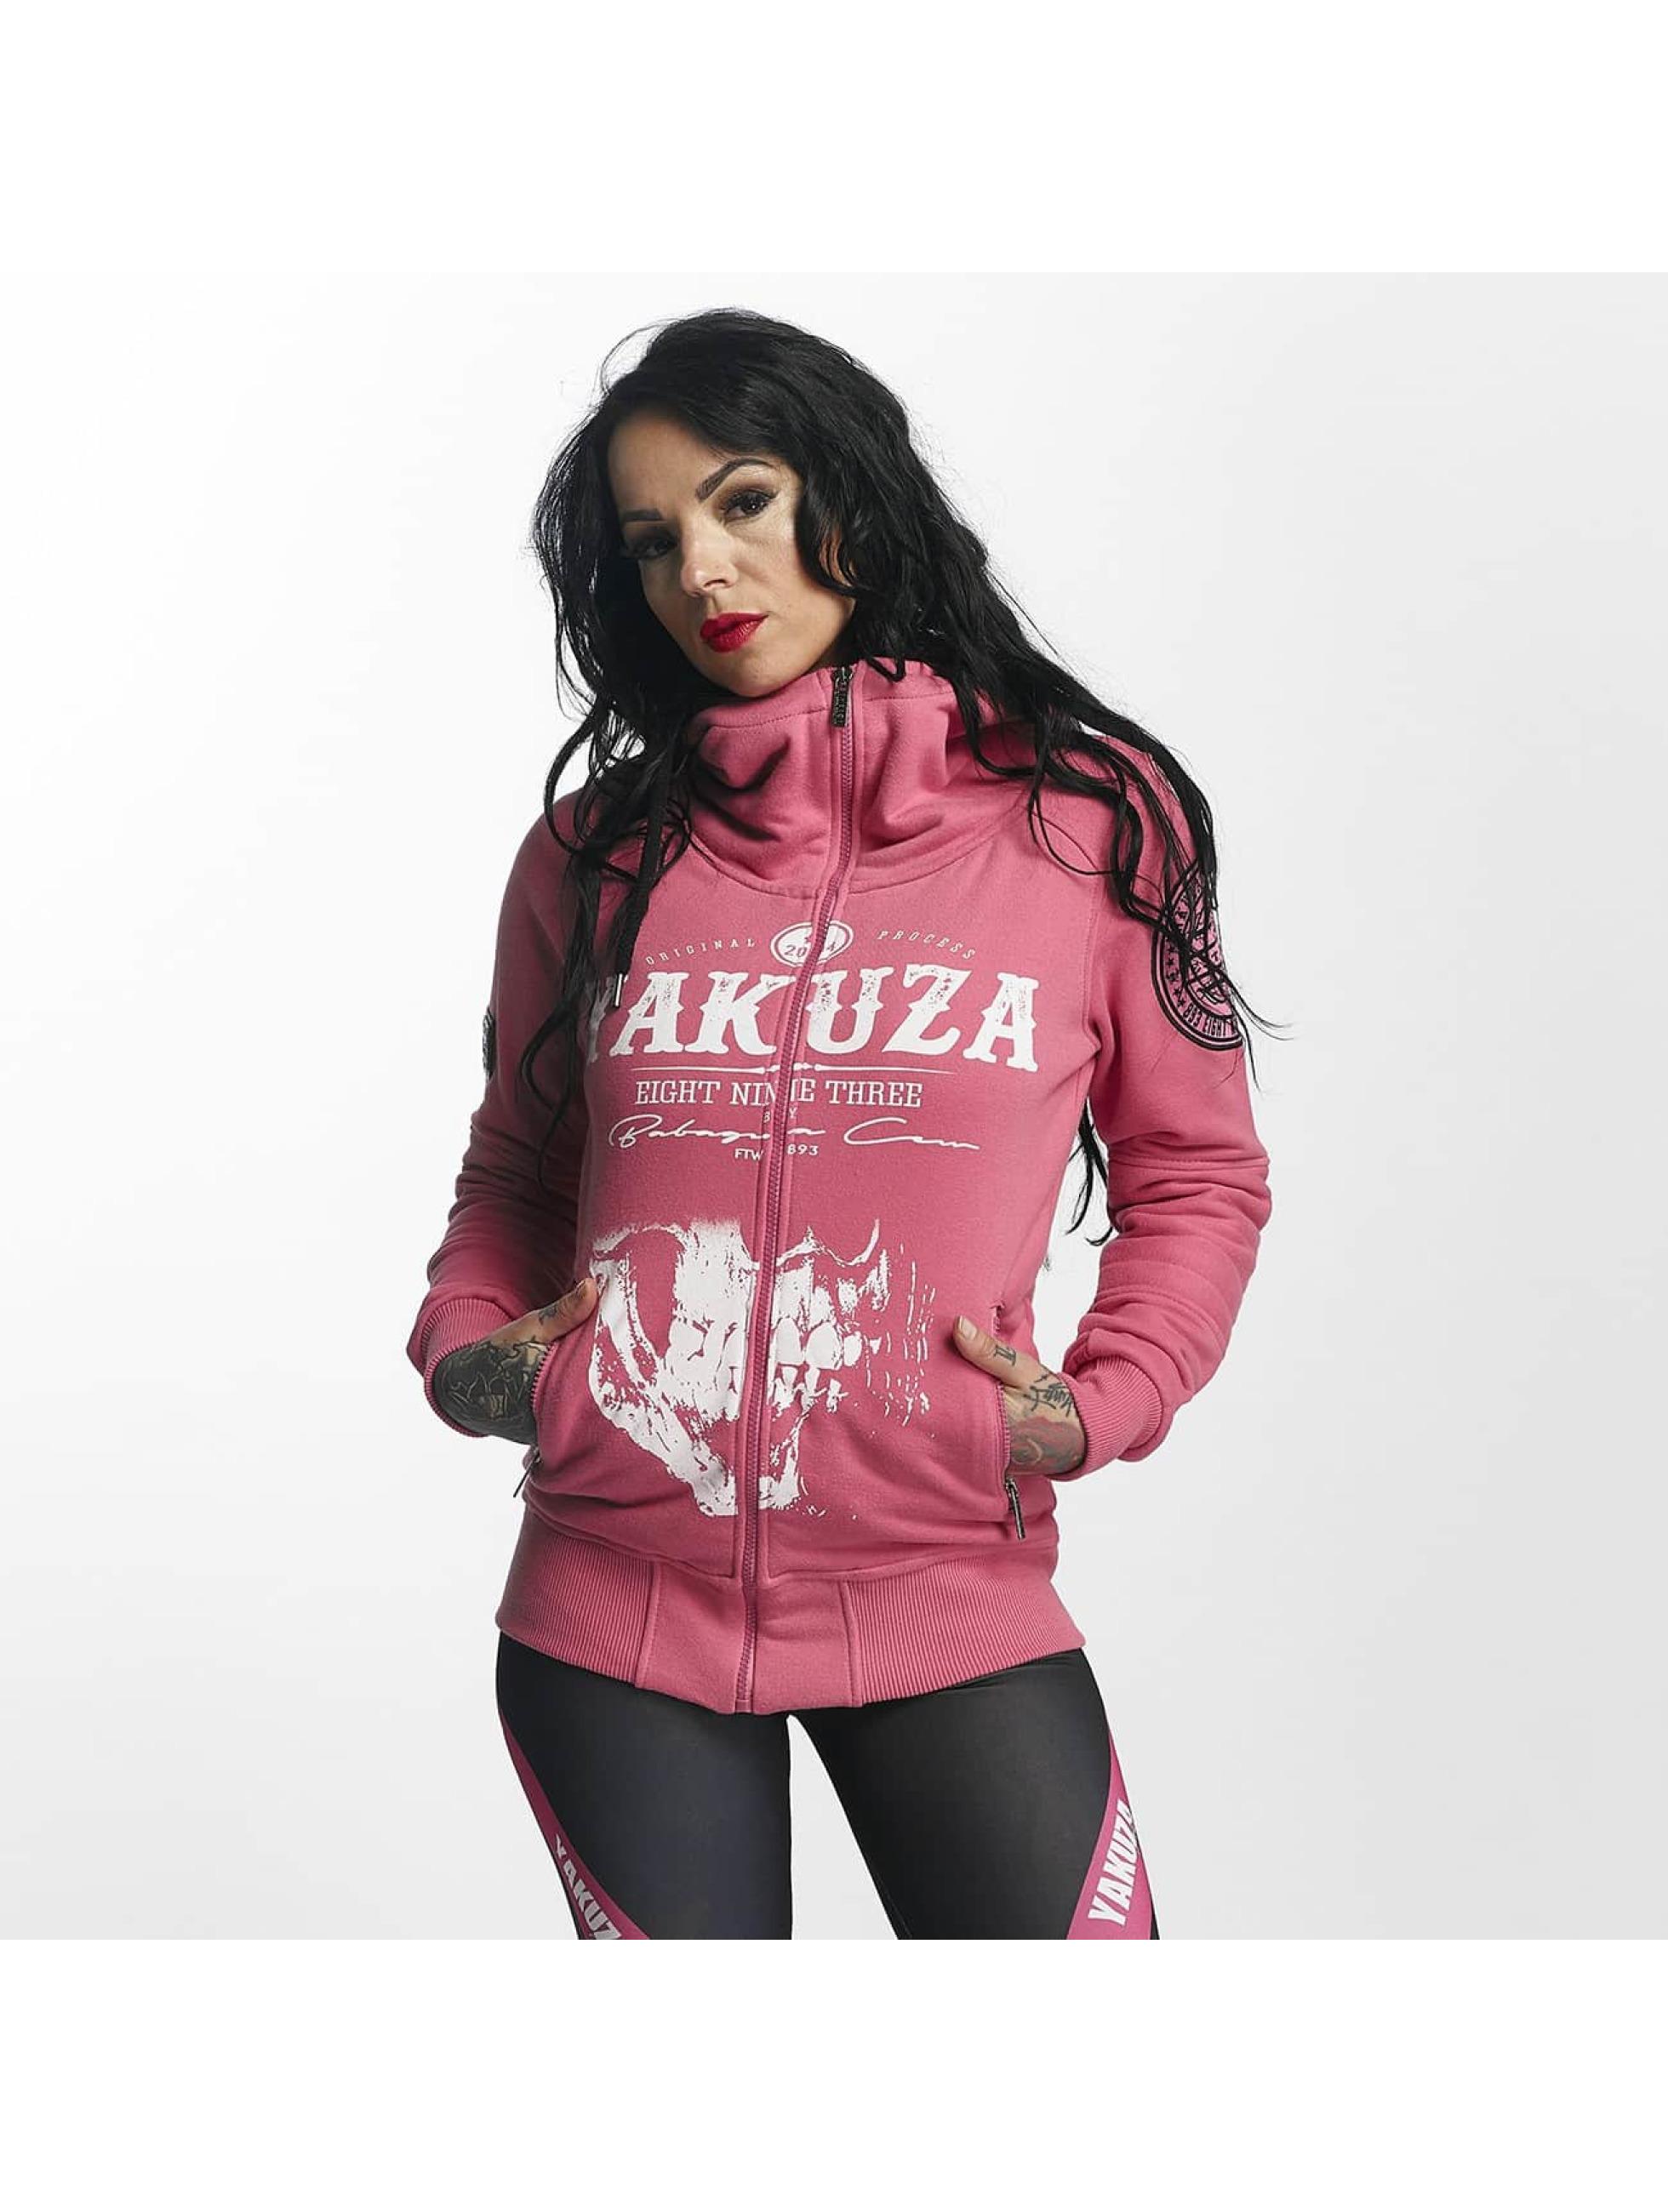 Yakuza Frauen Zip Hoodie Daily Skull High Neck in pink